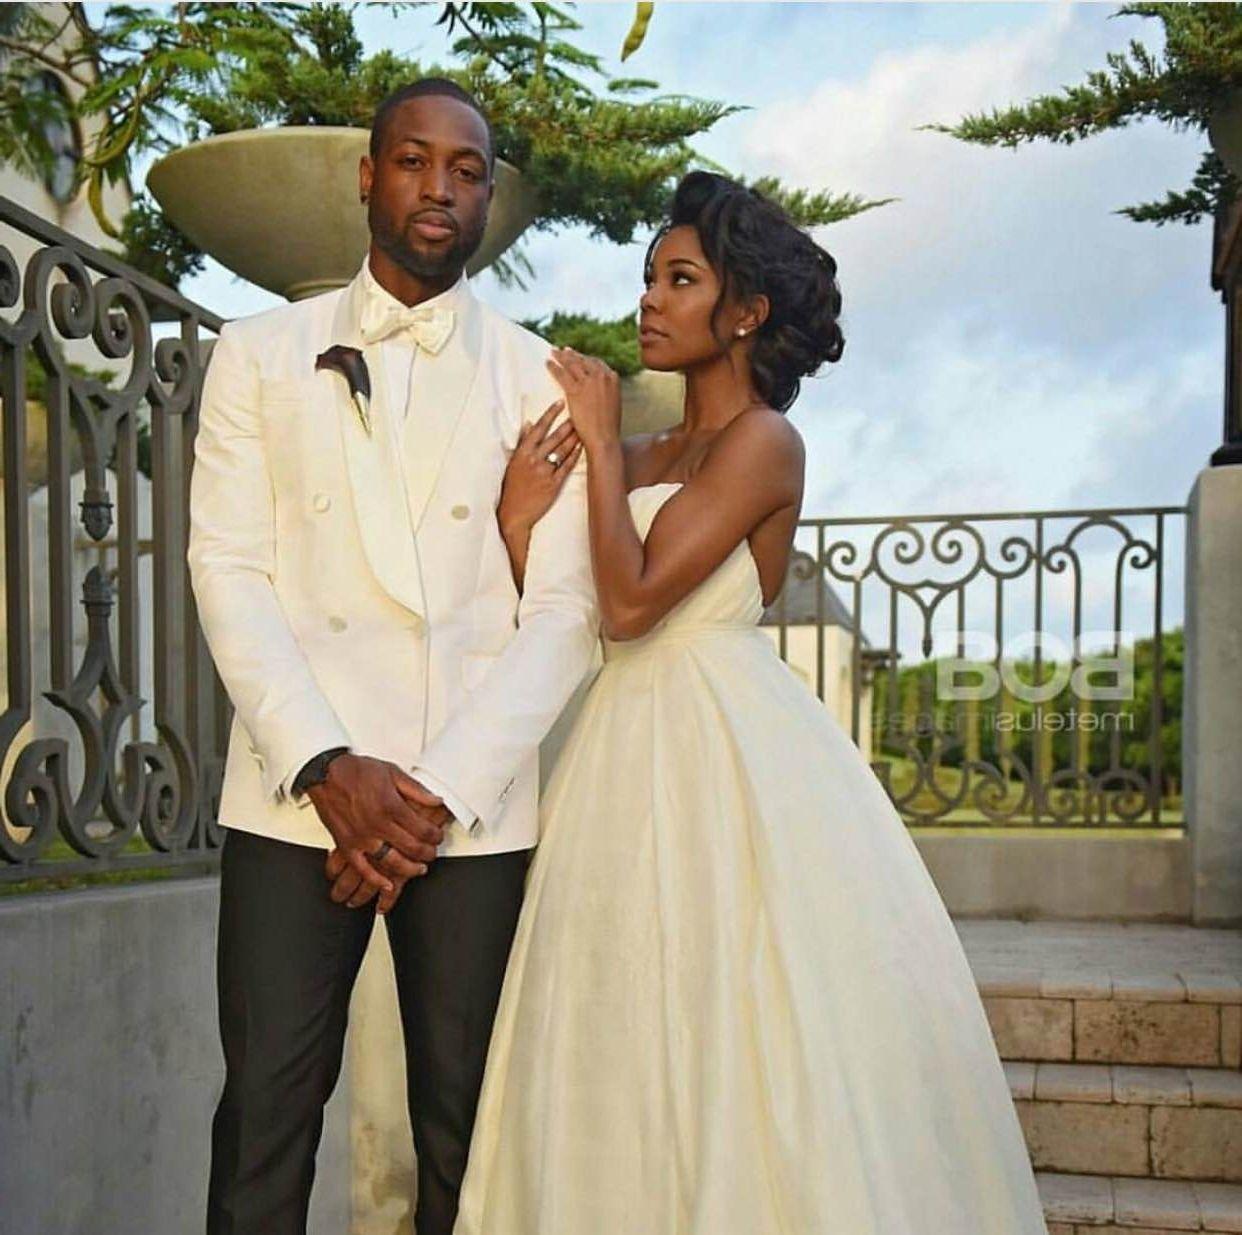 Gabrielle Union Wedding Photos : August 31 2014 Wsvn ...  Gabrielle Union Wedding Pictures